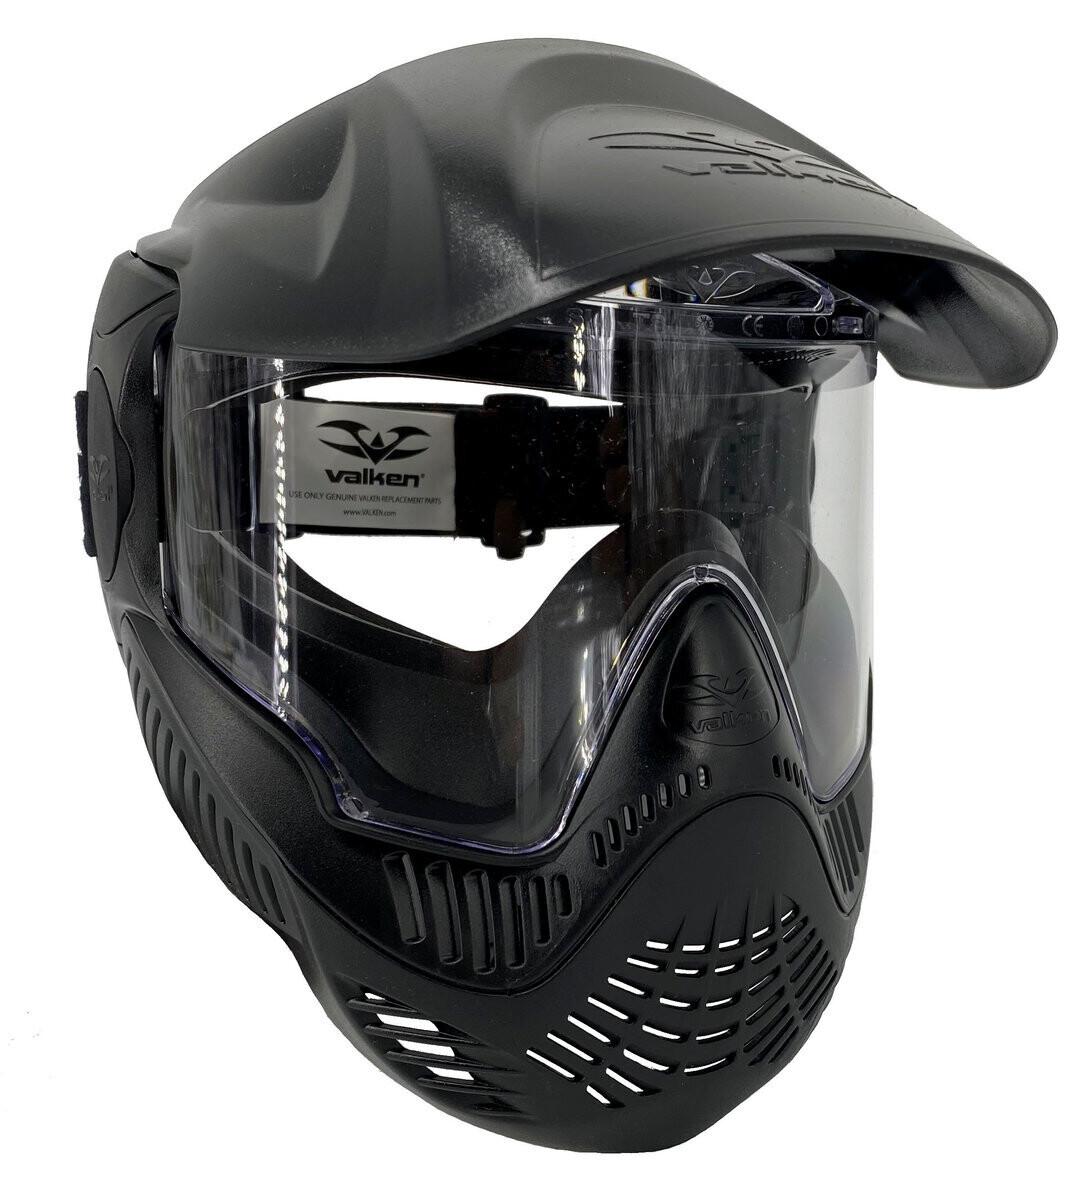 Valken MI-5 Single Lens Field Goggles - Black